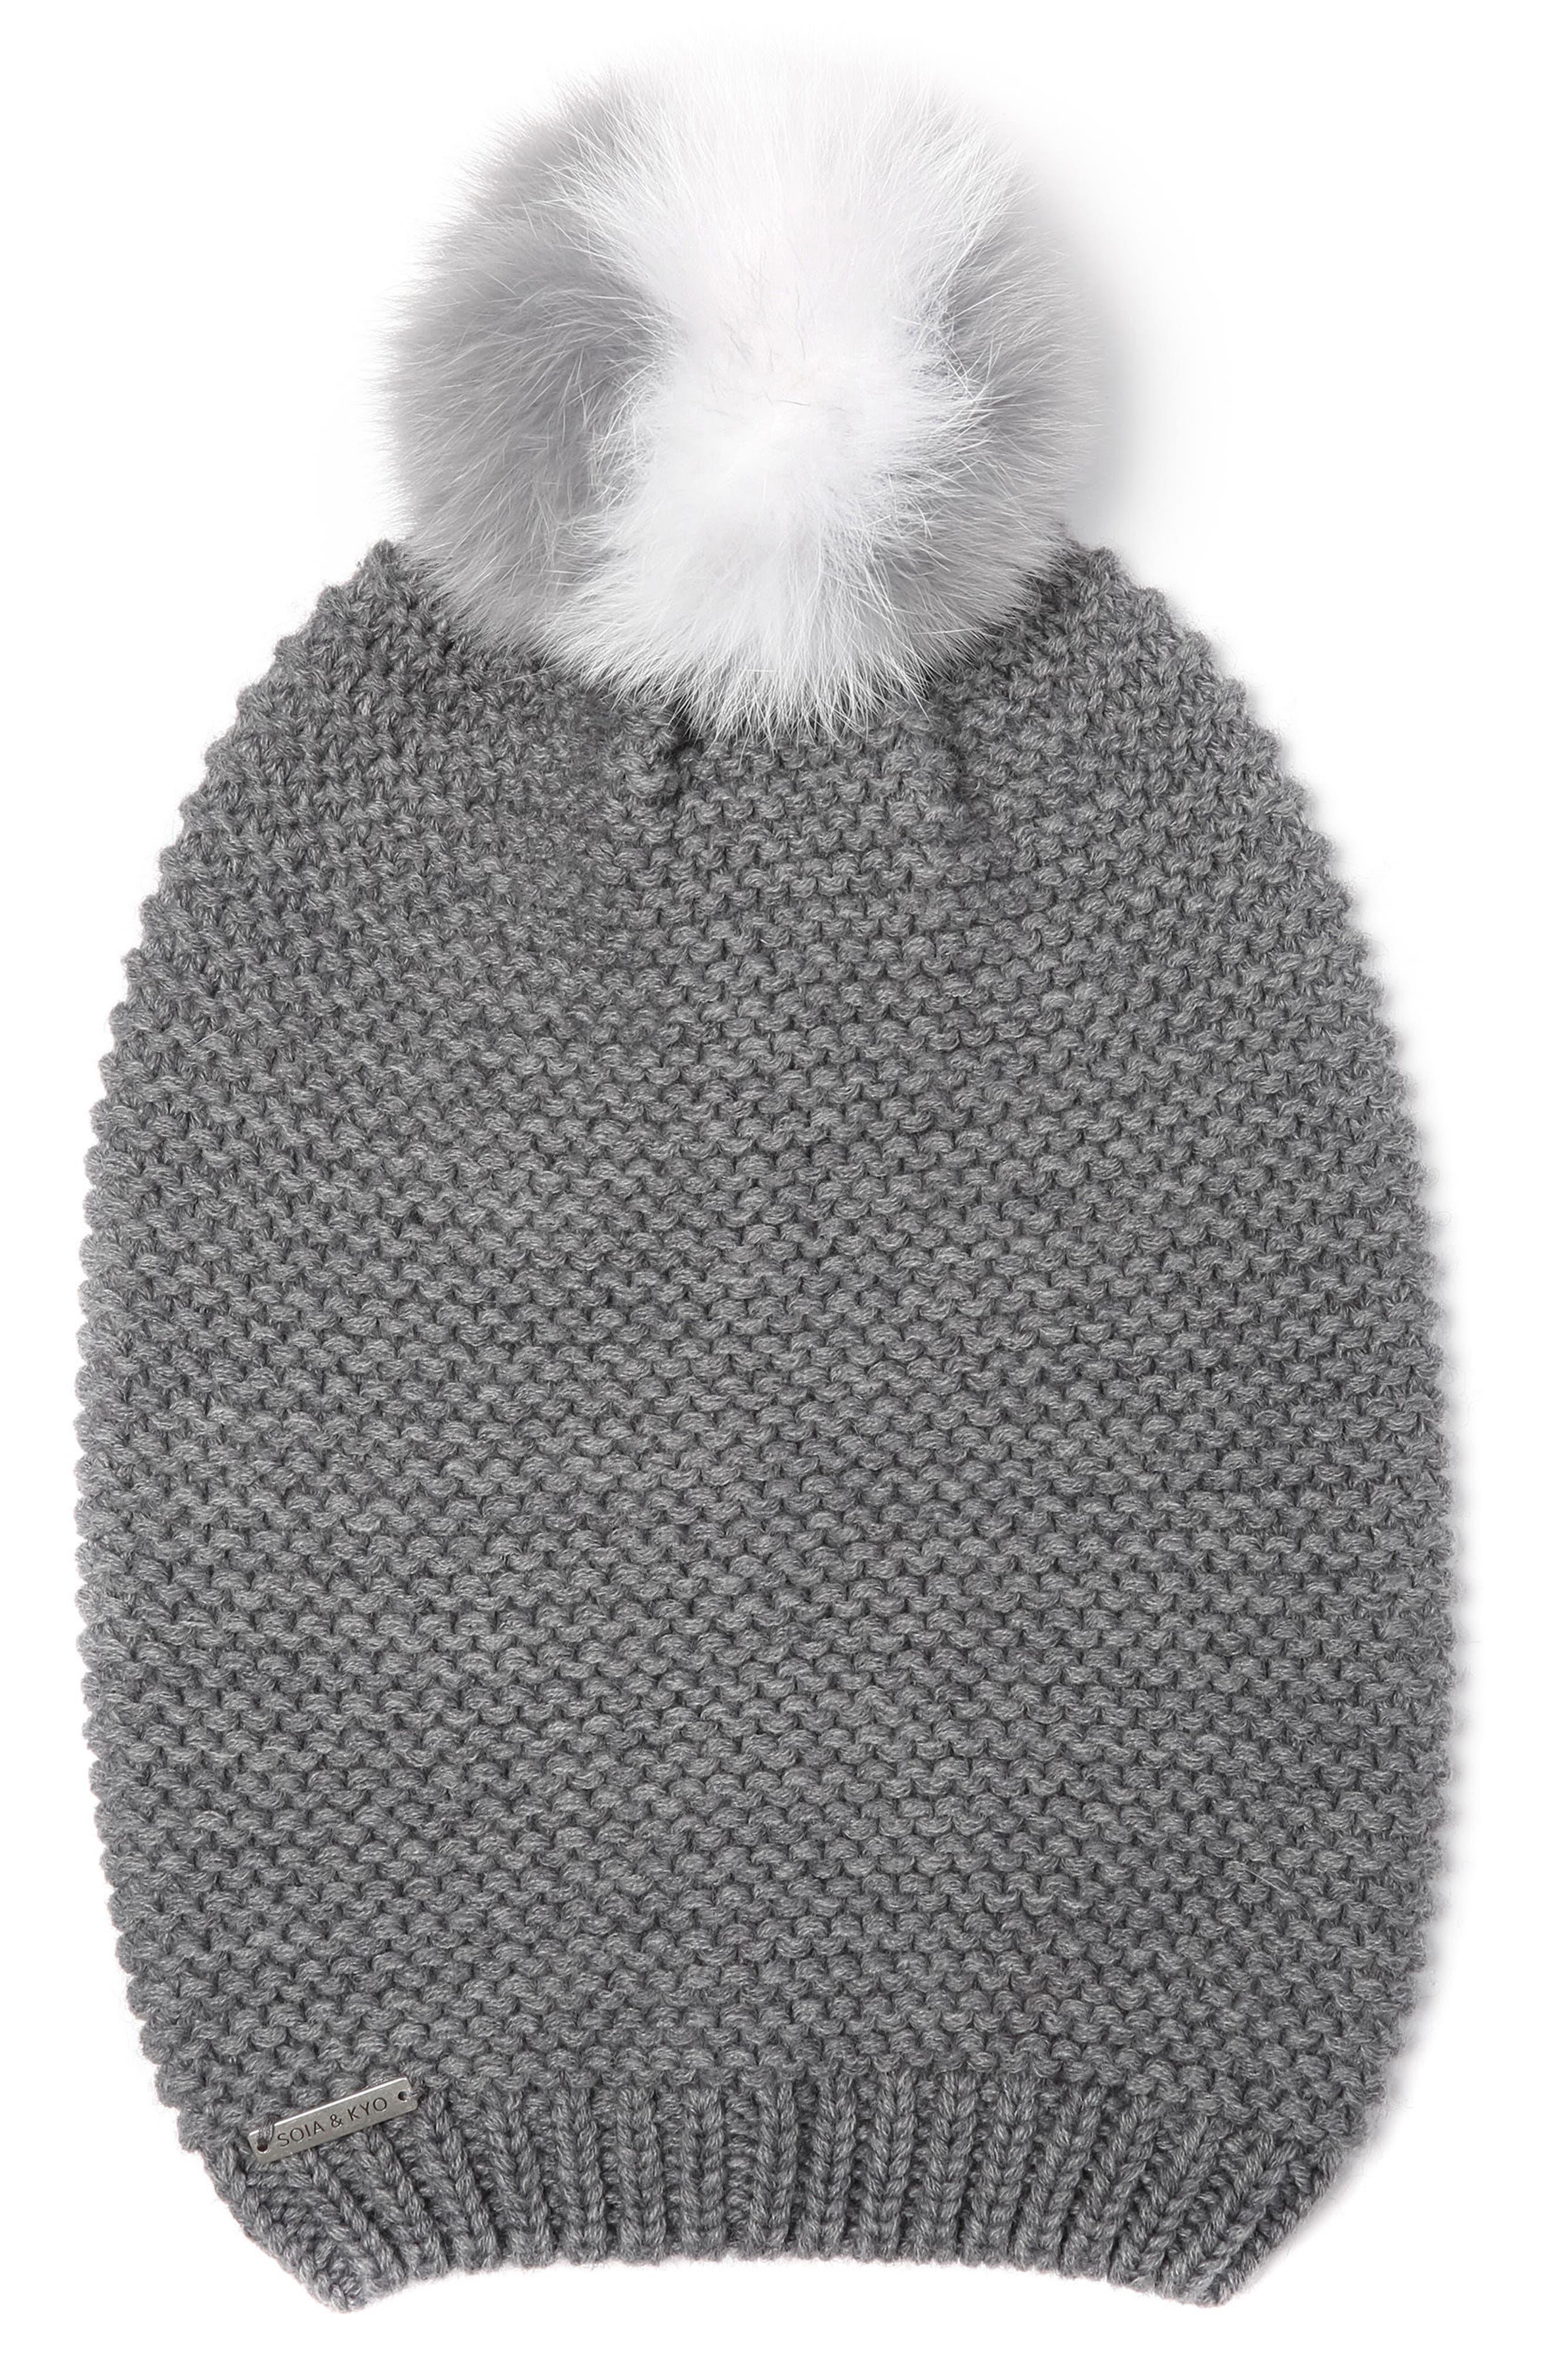 Slouchy Knit Beanie with Genuine Fox Fur Pompom,                         Main,                         color, 020